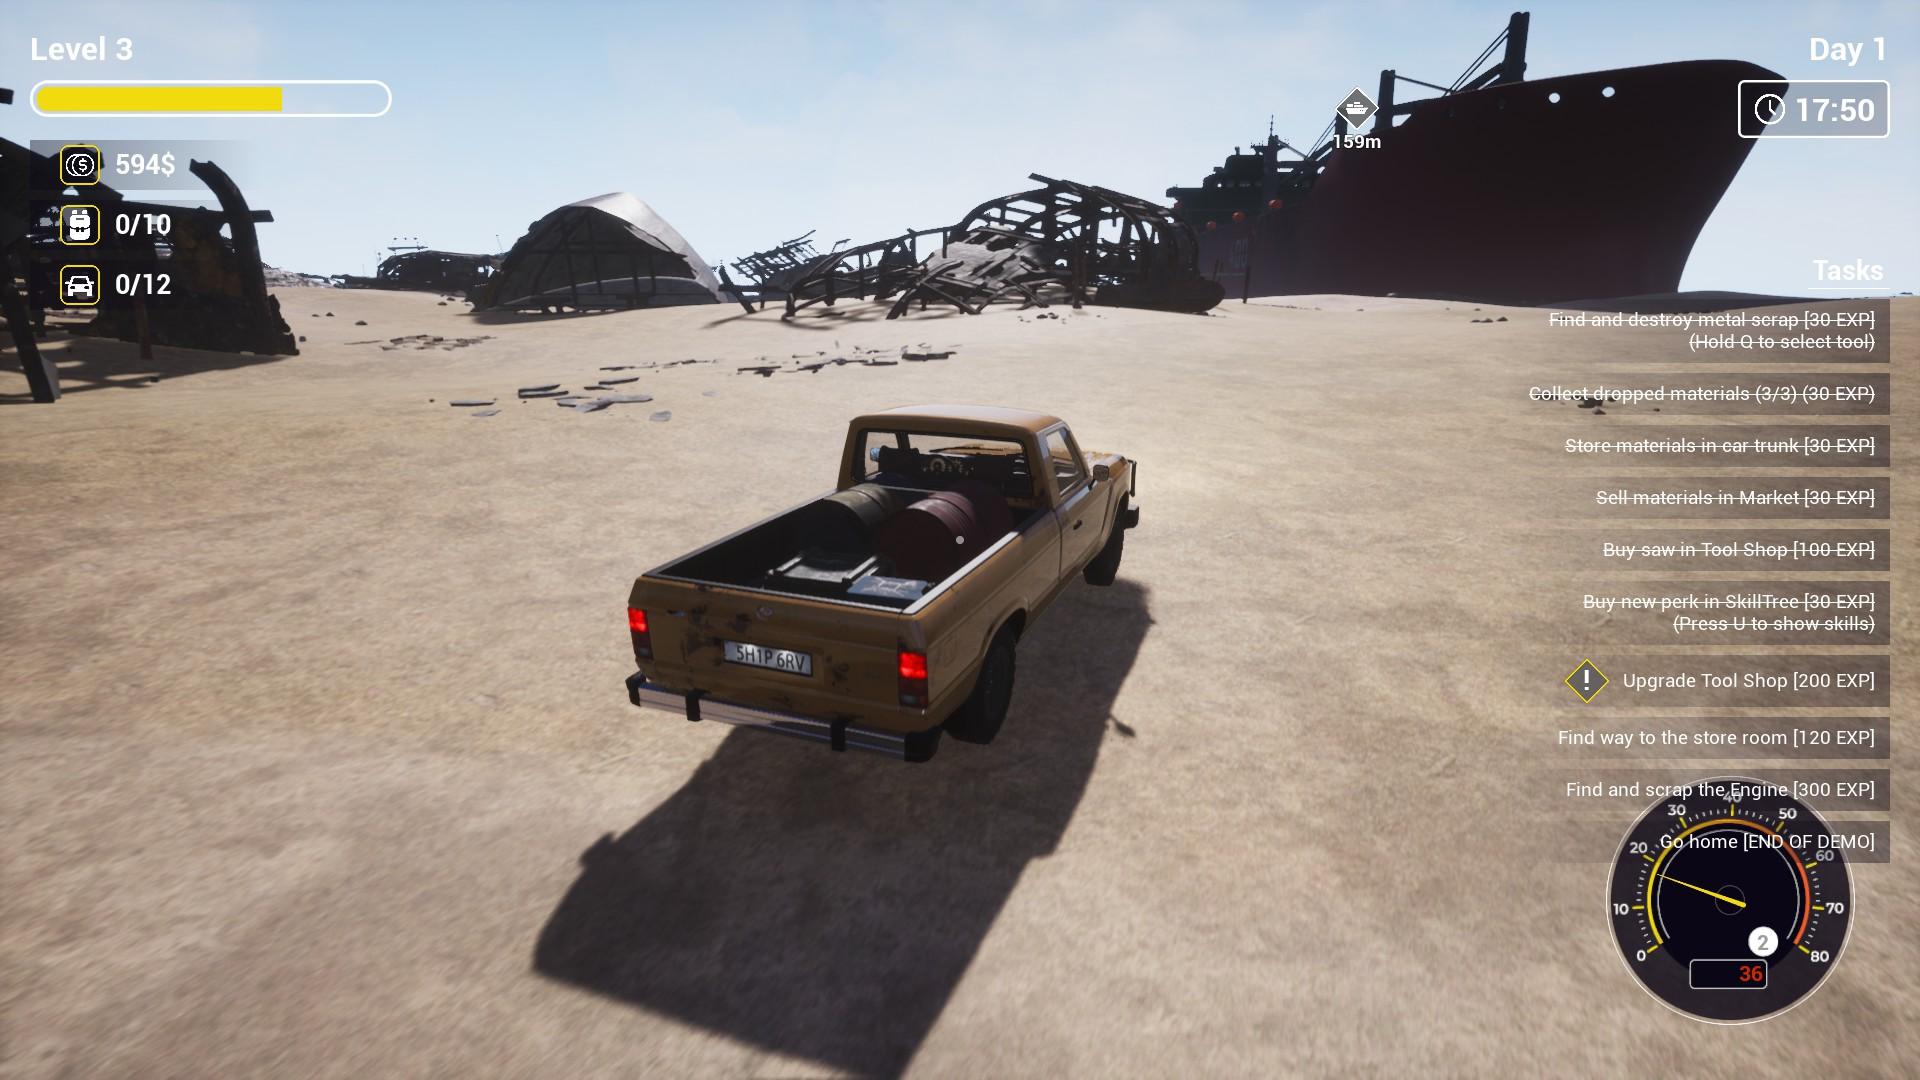 Ship Graveyard Demo Demo 2